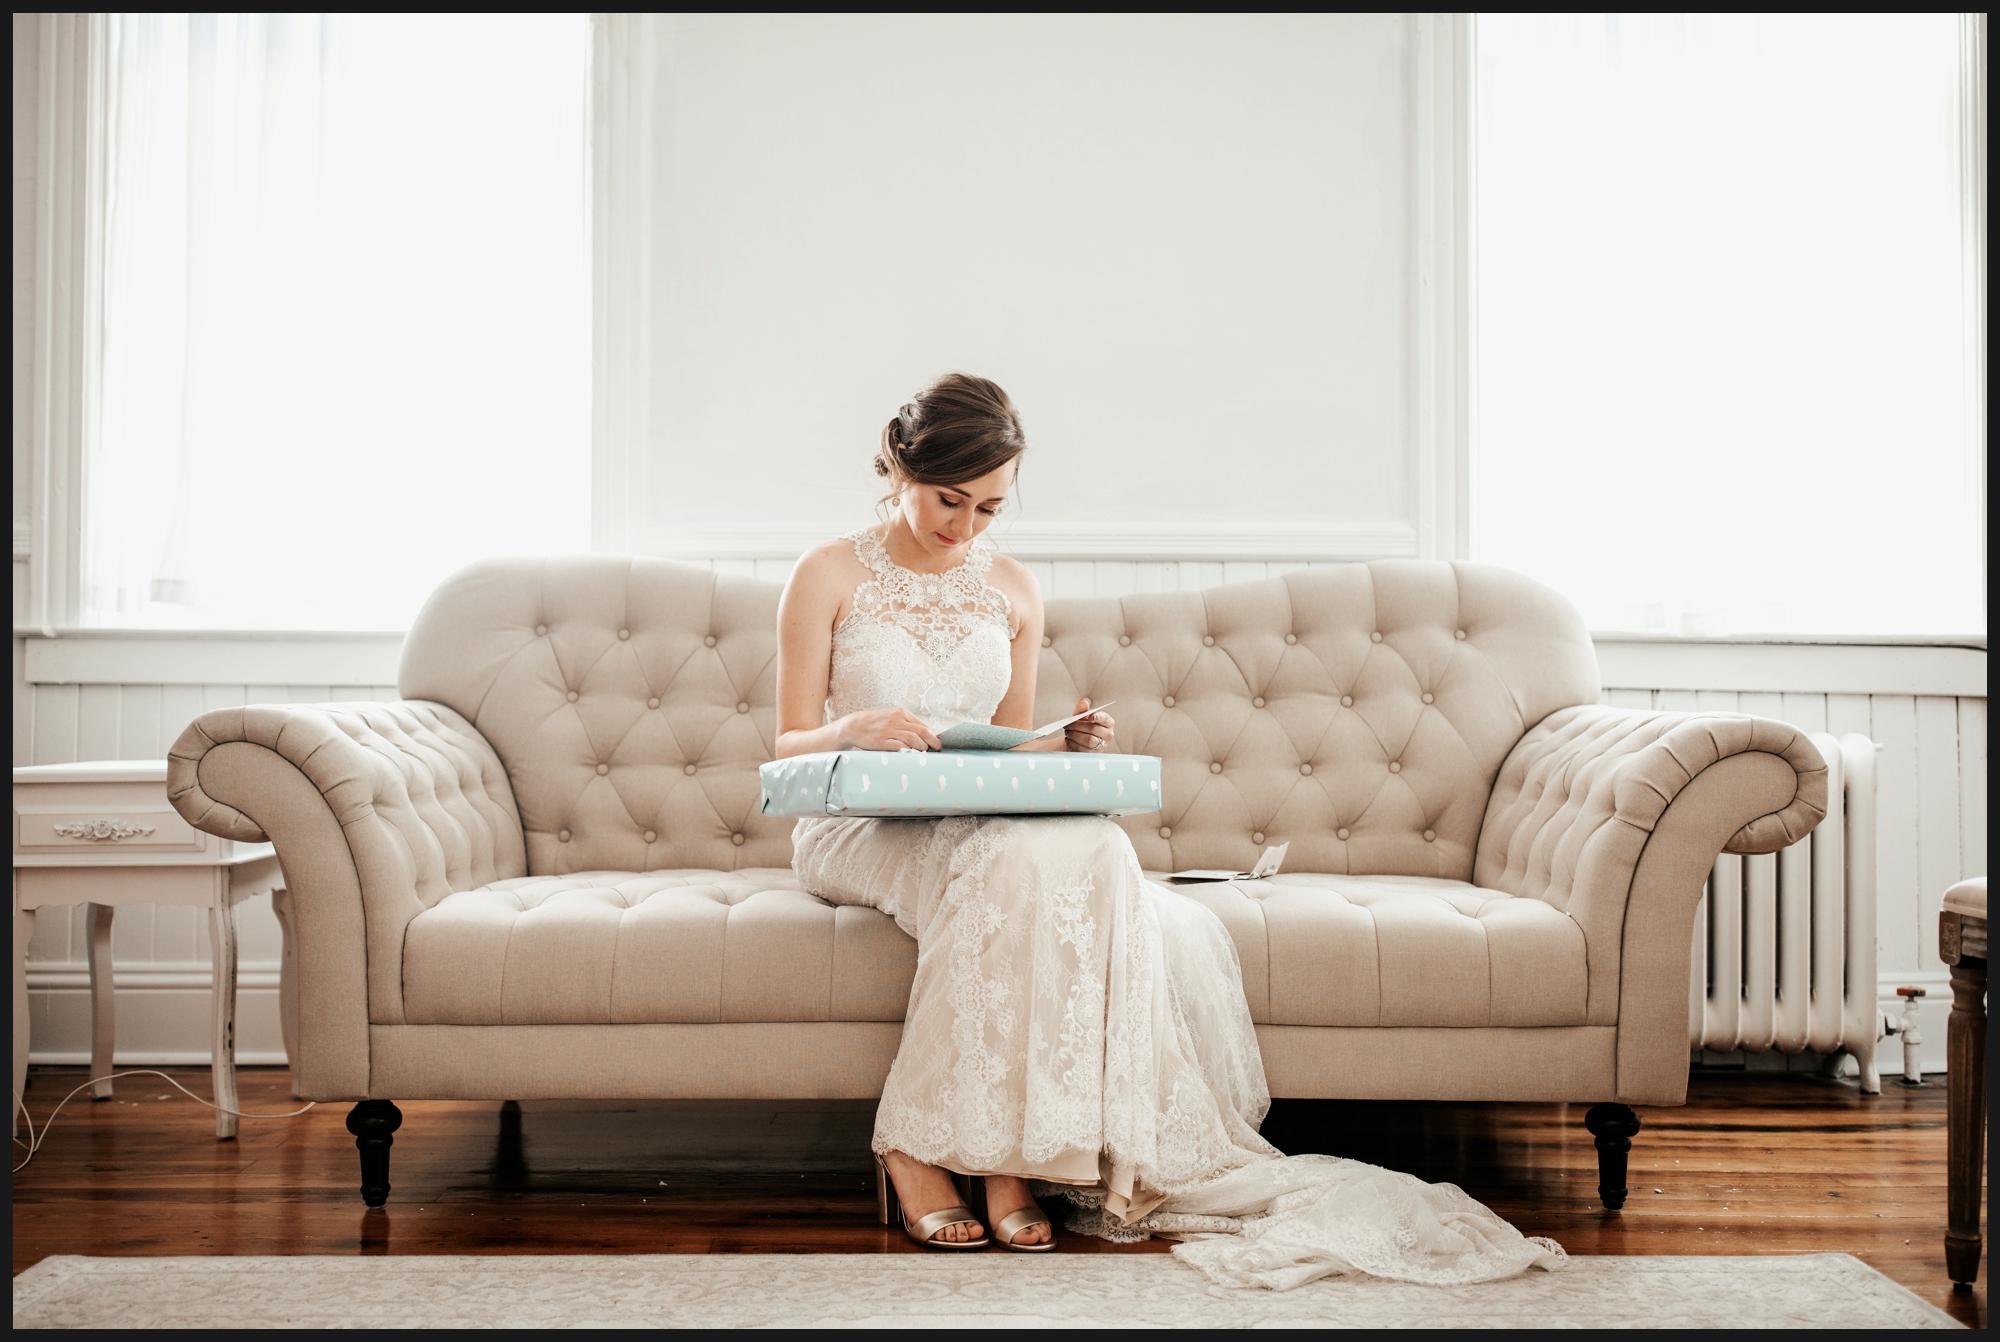 Orlando-Wedding-Photographer-destination-wedding-photographer-florida-wedding-photographer-bohemian-wedding-photographer_1726.jpg